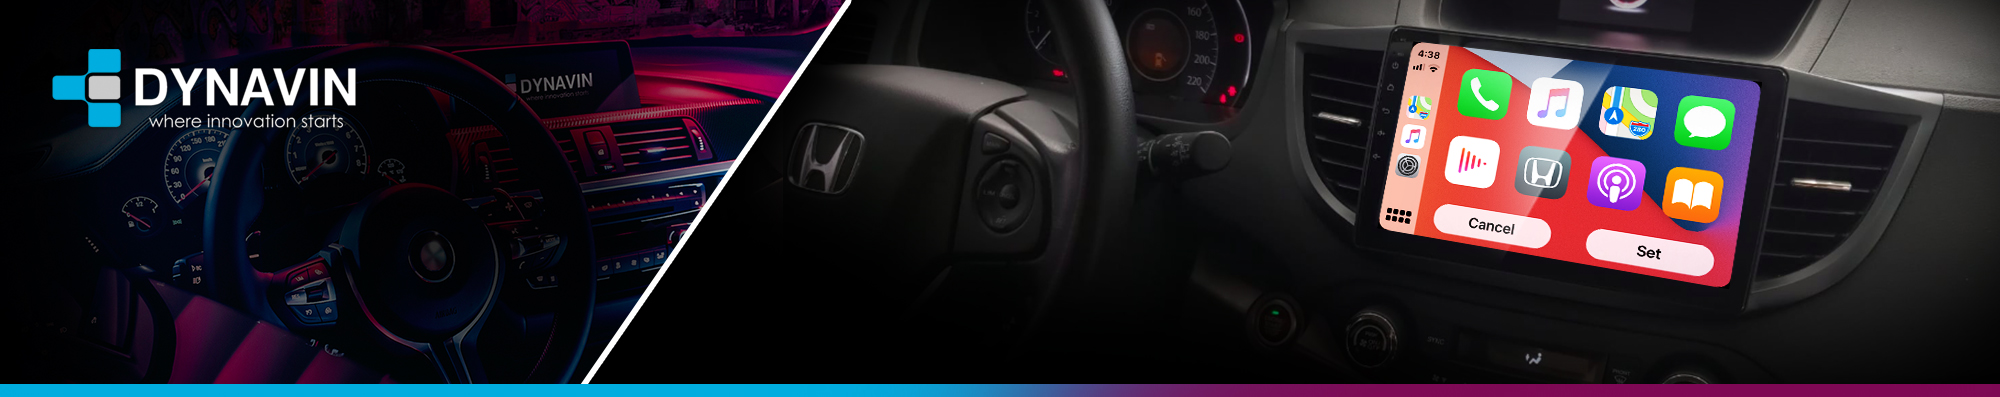 Honda CRV 2012 2013 2014 2015 2016 2017 2018